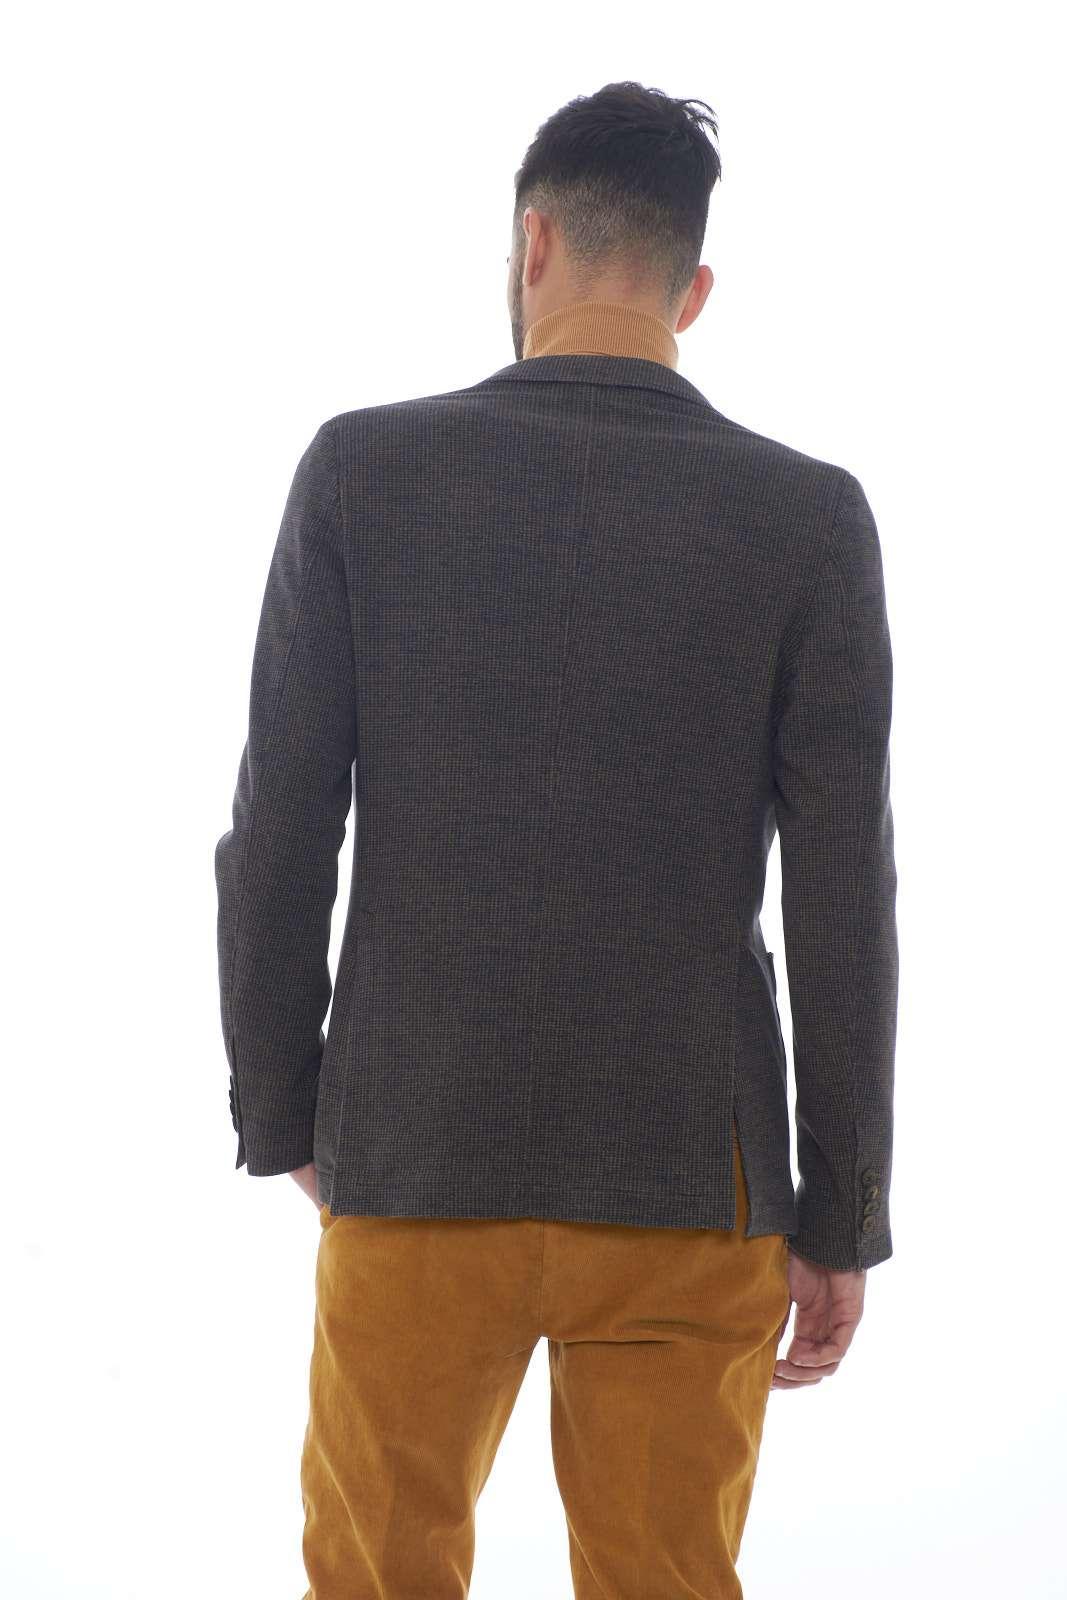 https://www.parmax.com/media/catalog/product/a/i/AI-outlet_parmax-giacca-uomo-Manuel-Ritz-2732G2442T%20193515-C.jpg